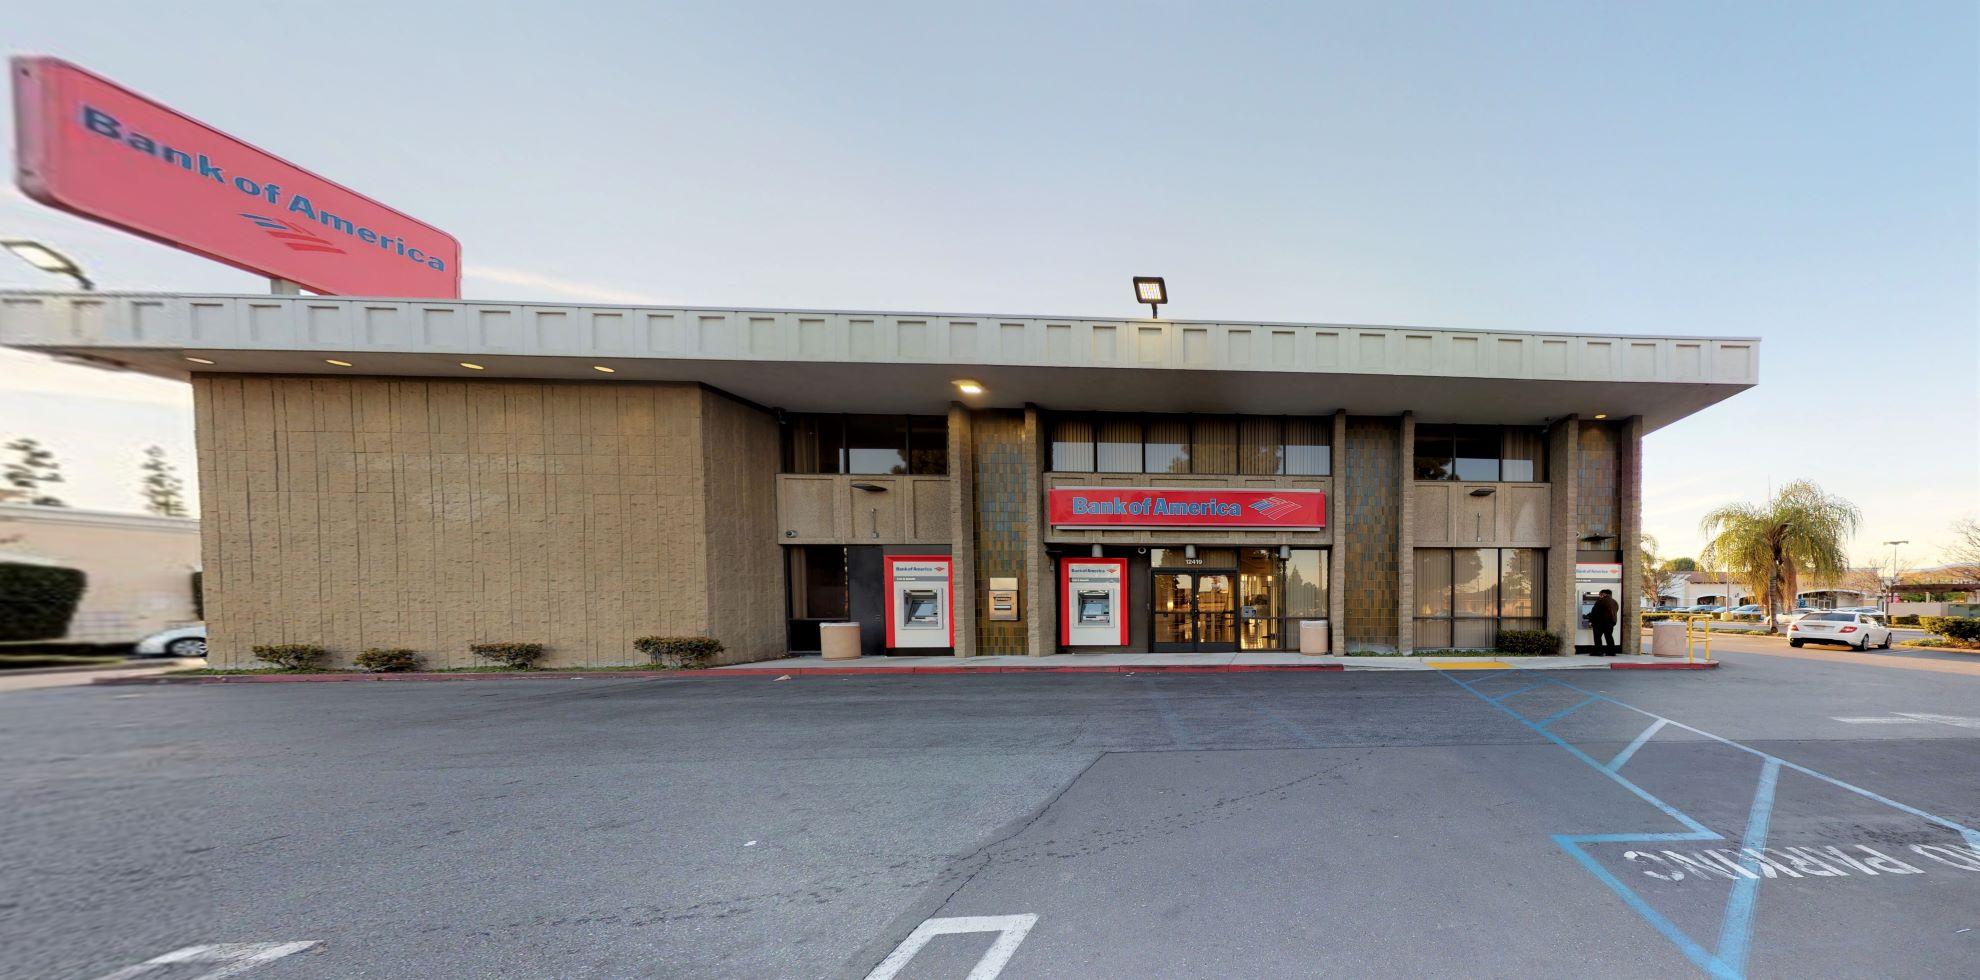 Bank of America financial center with walk-up ATM | 12419 Norwalk Blvd, Norwalk, CA 90650